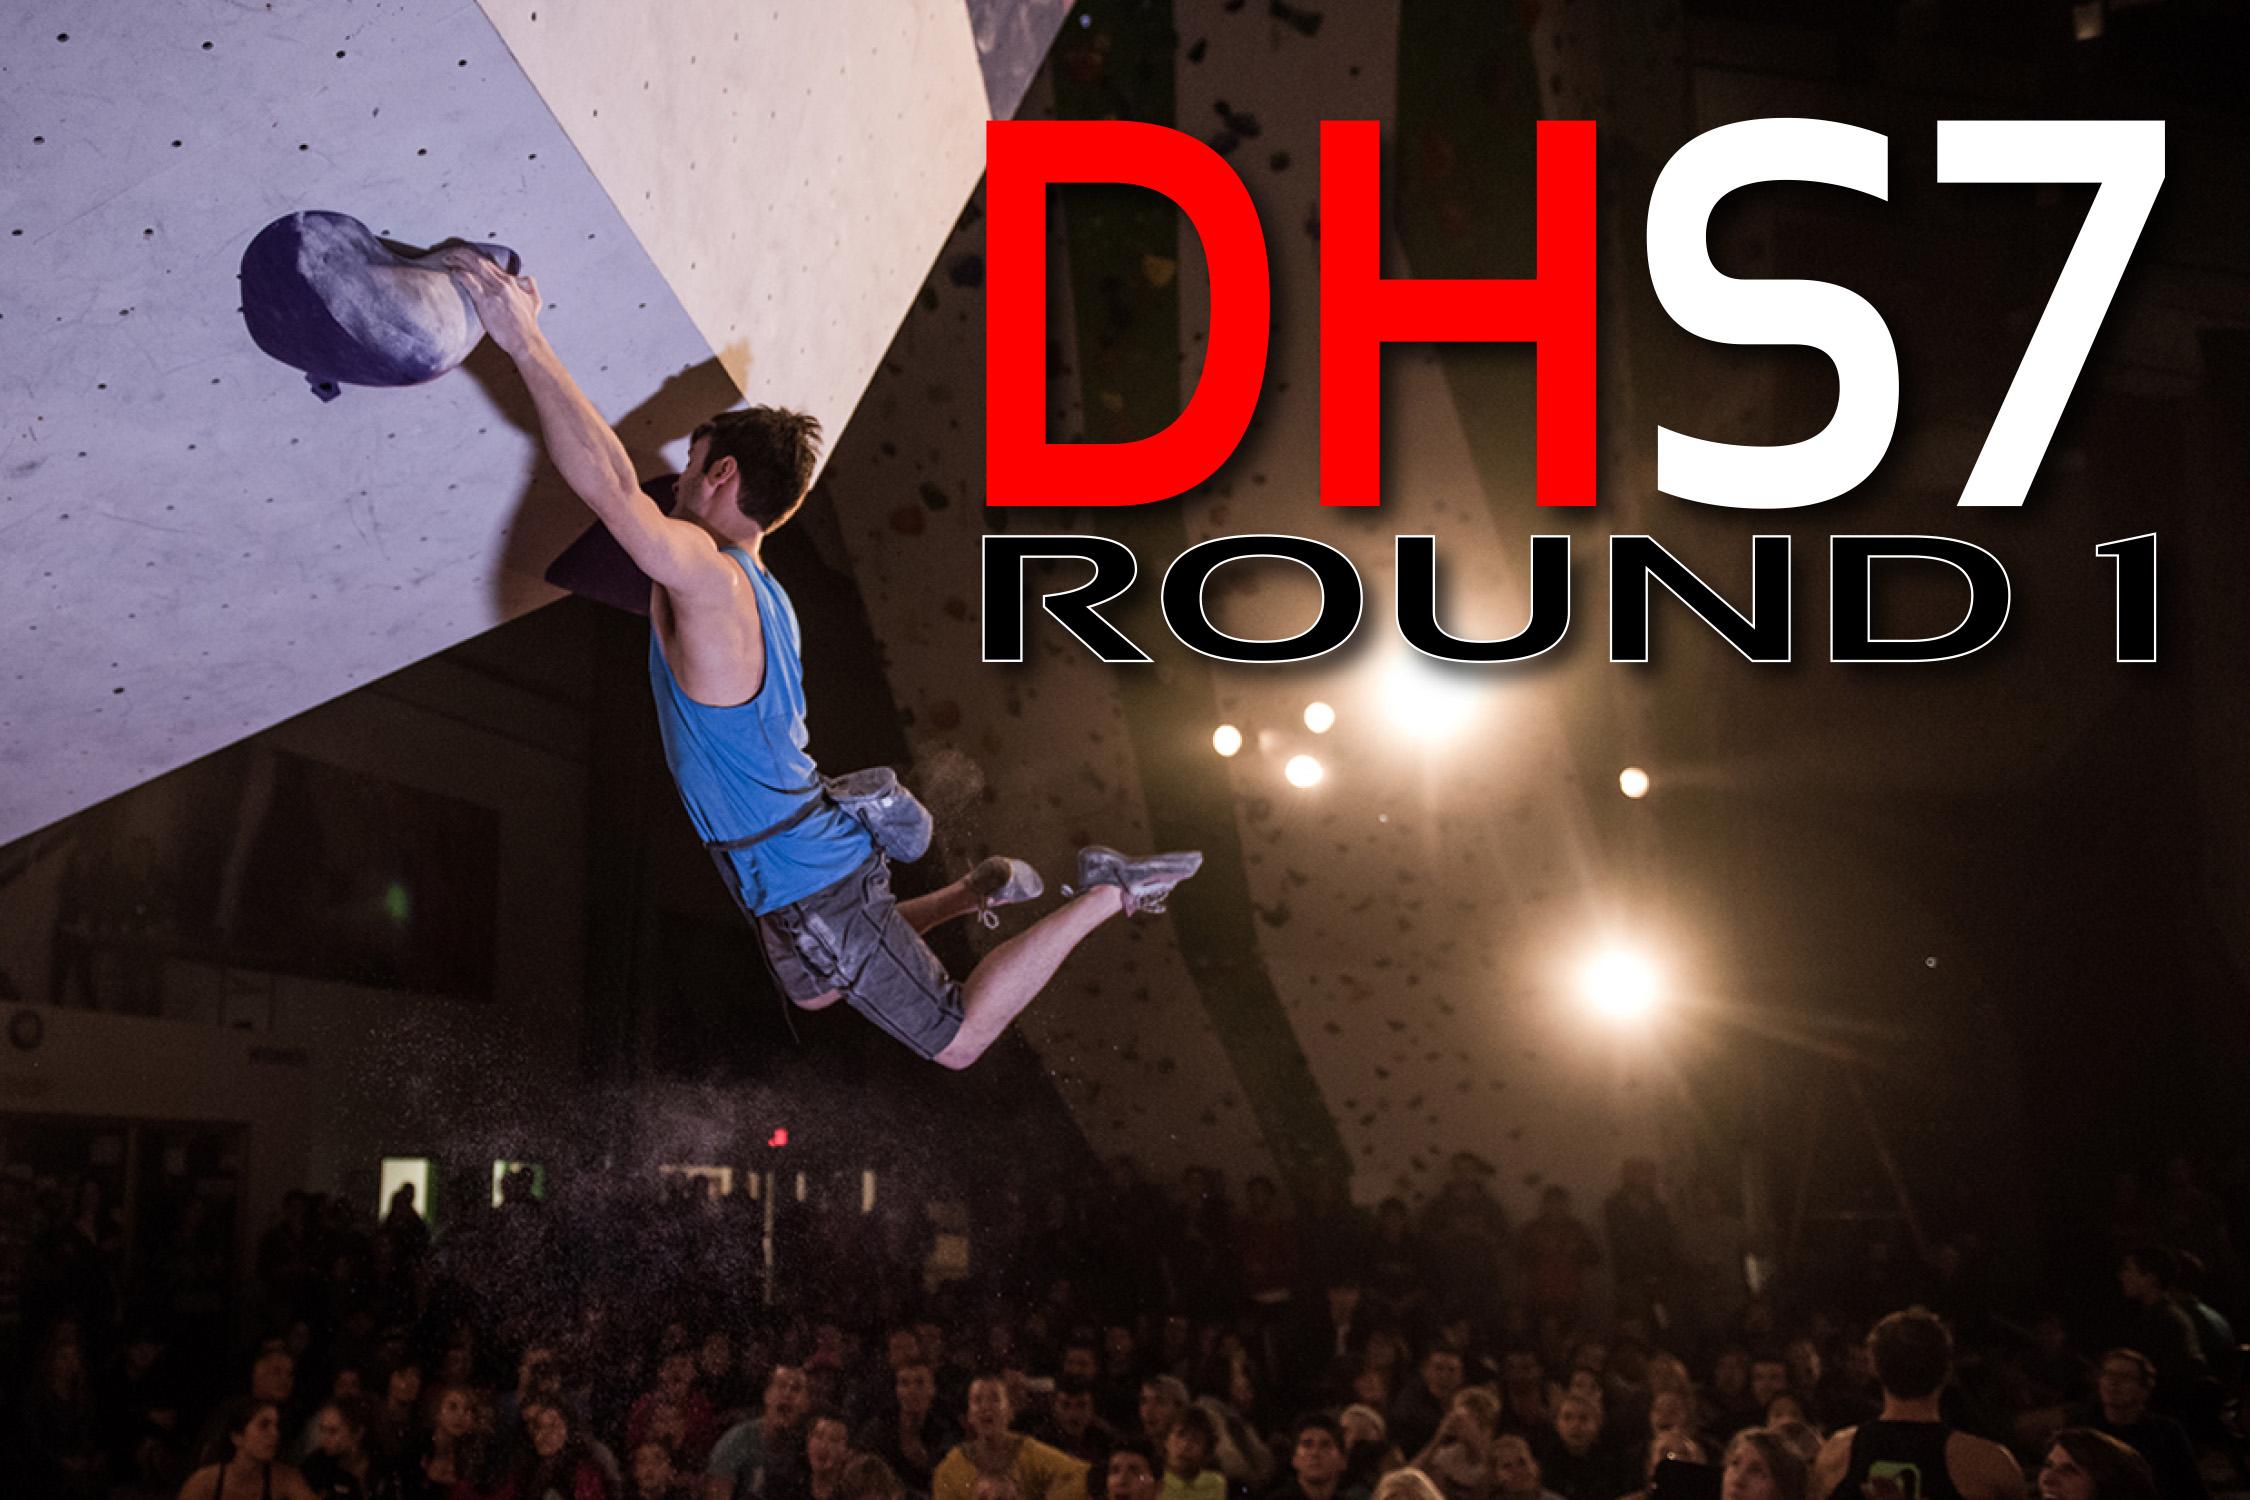 DHS7 - ROUND 1